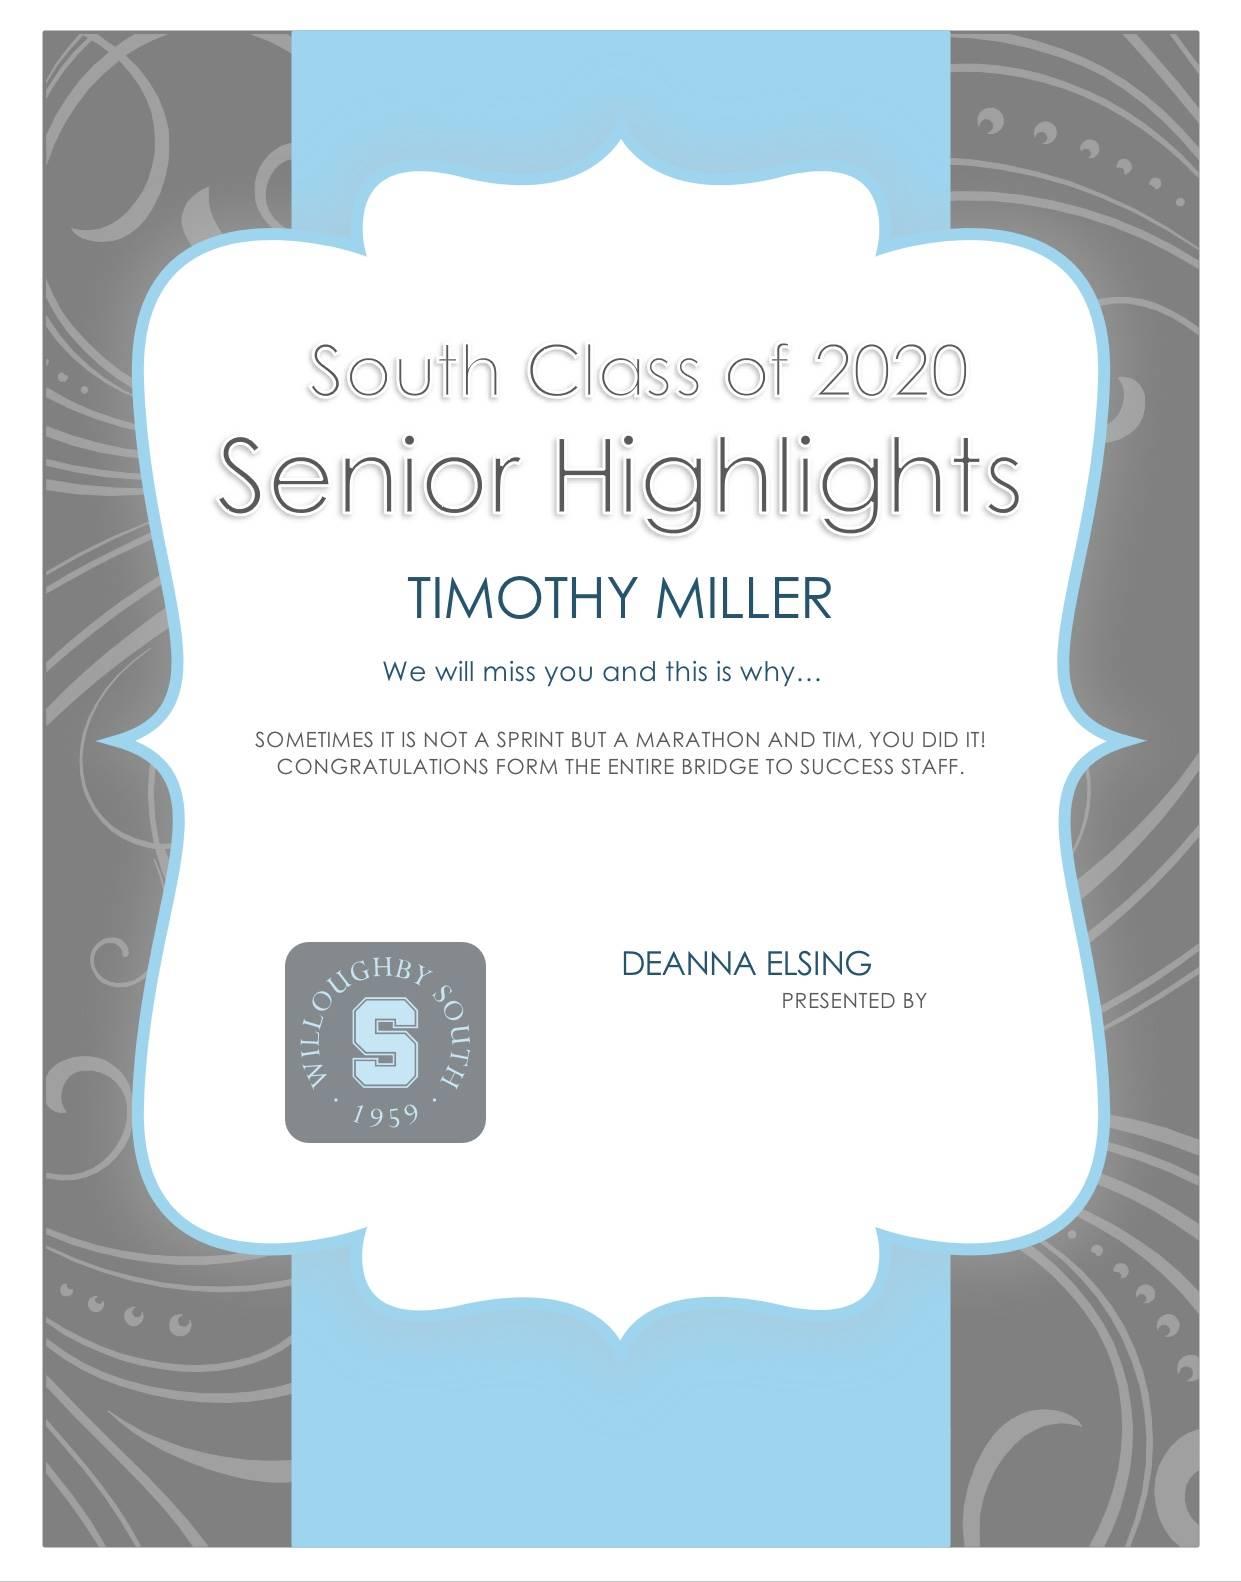 Timothy Miller